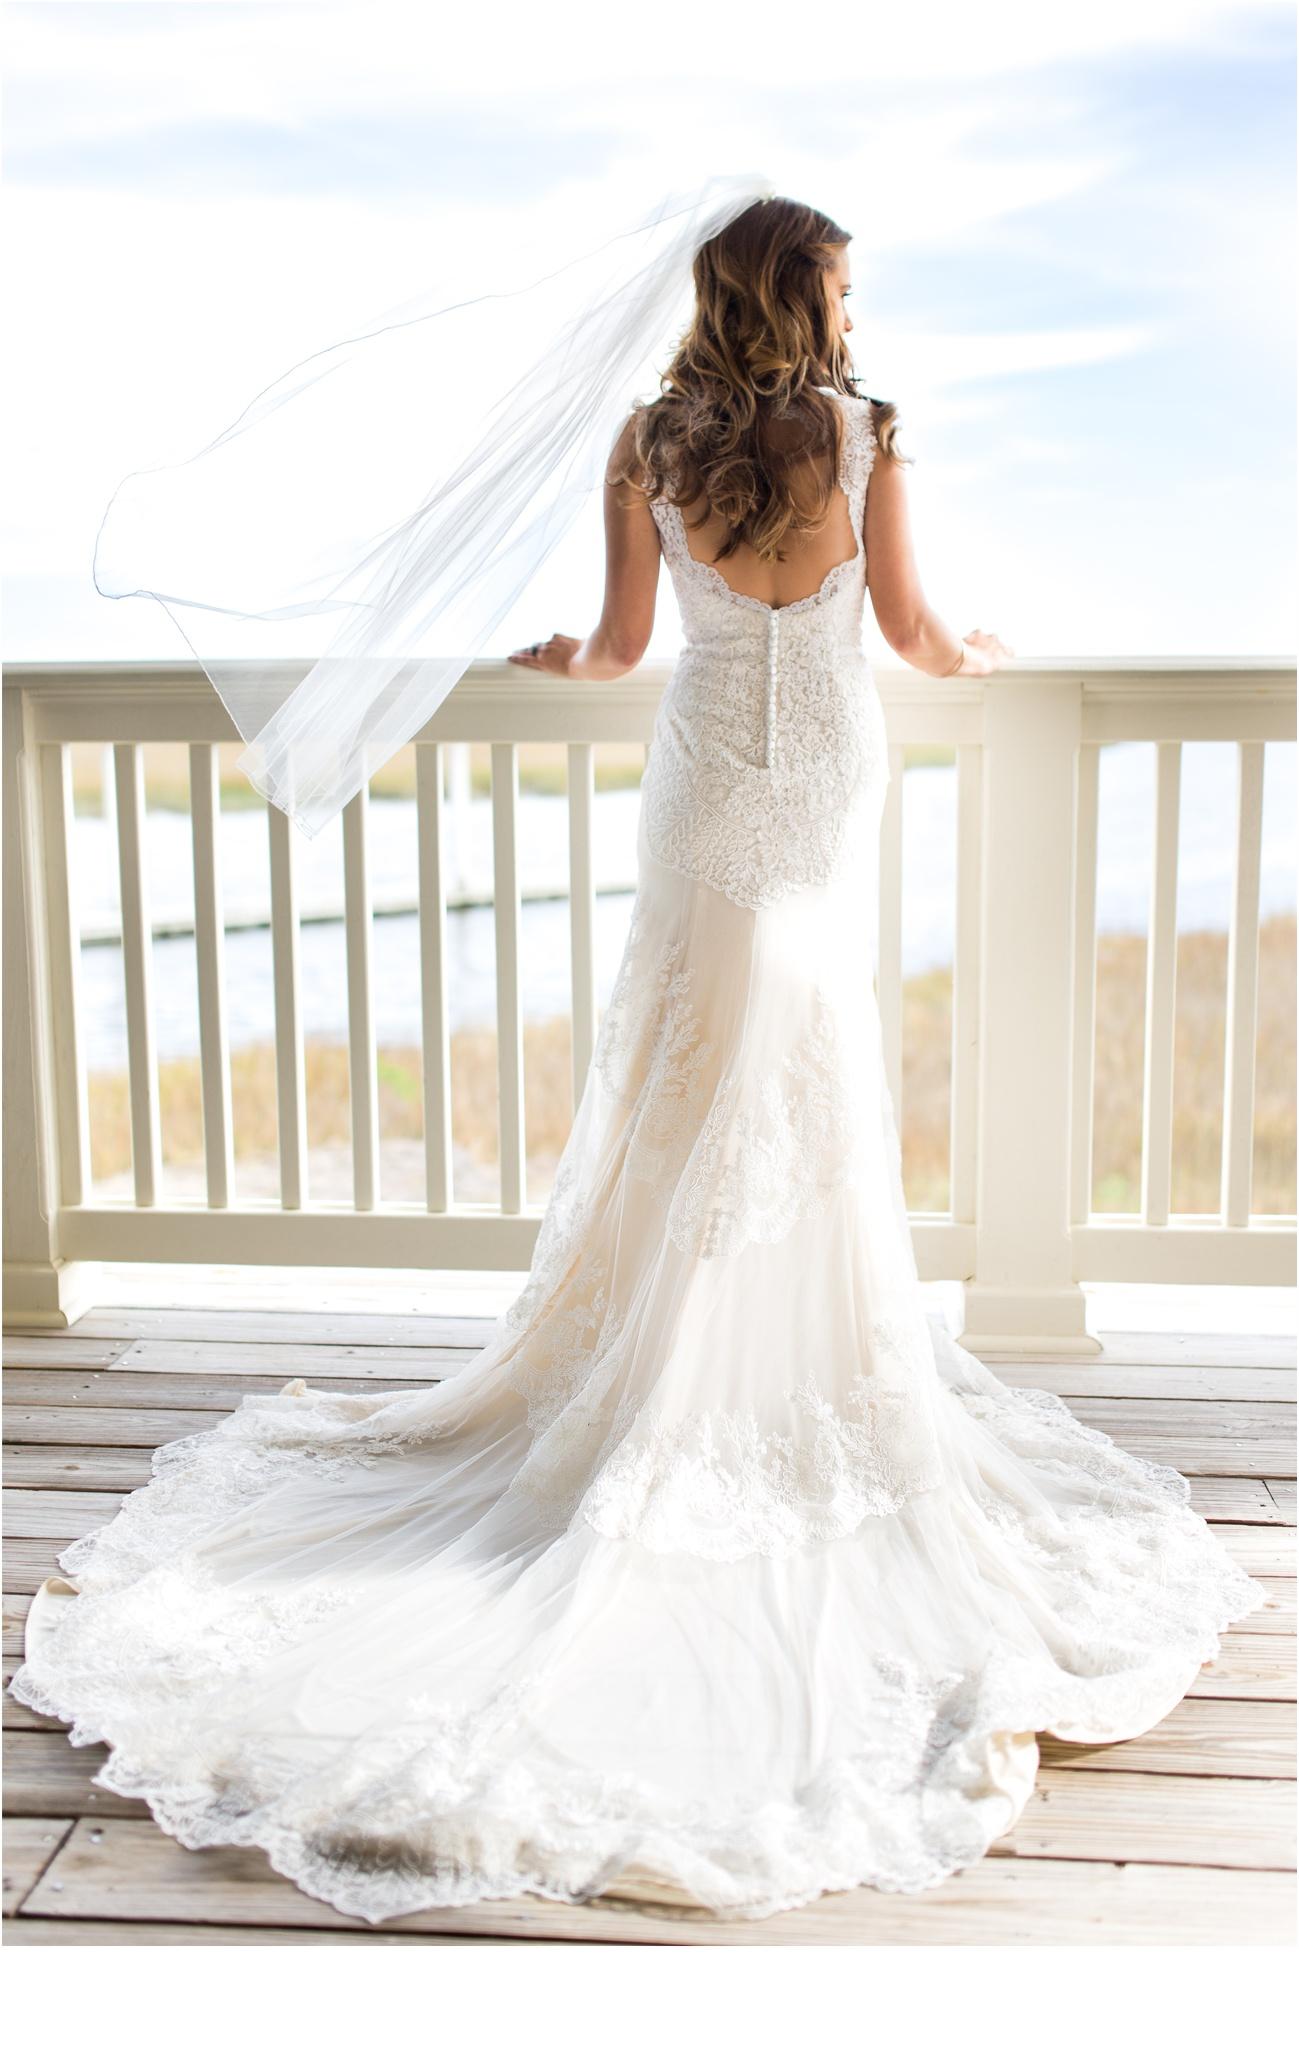 Rainey_Gregg_Photography_St._Simons_Island_Georgia_California_Wedding_Portrait_Photography_0775.jpg